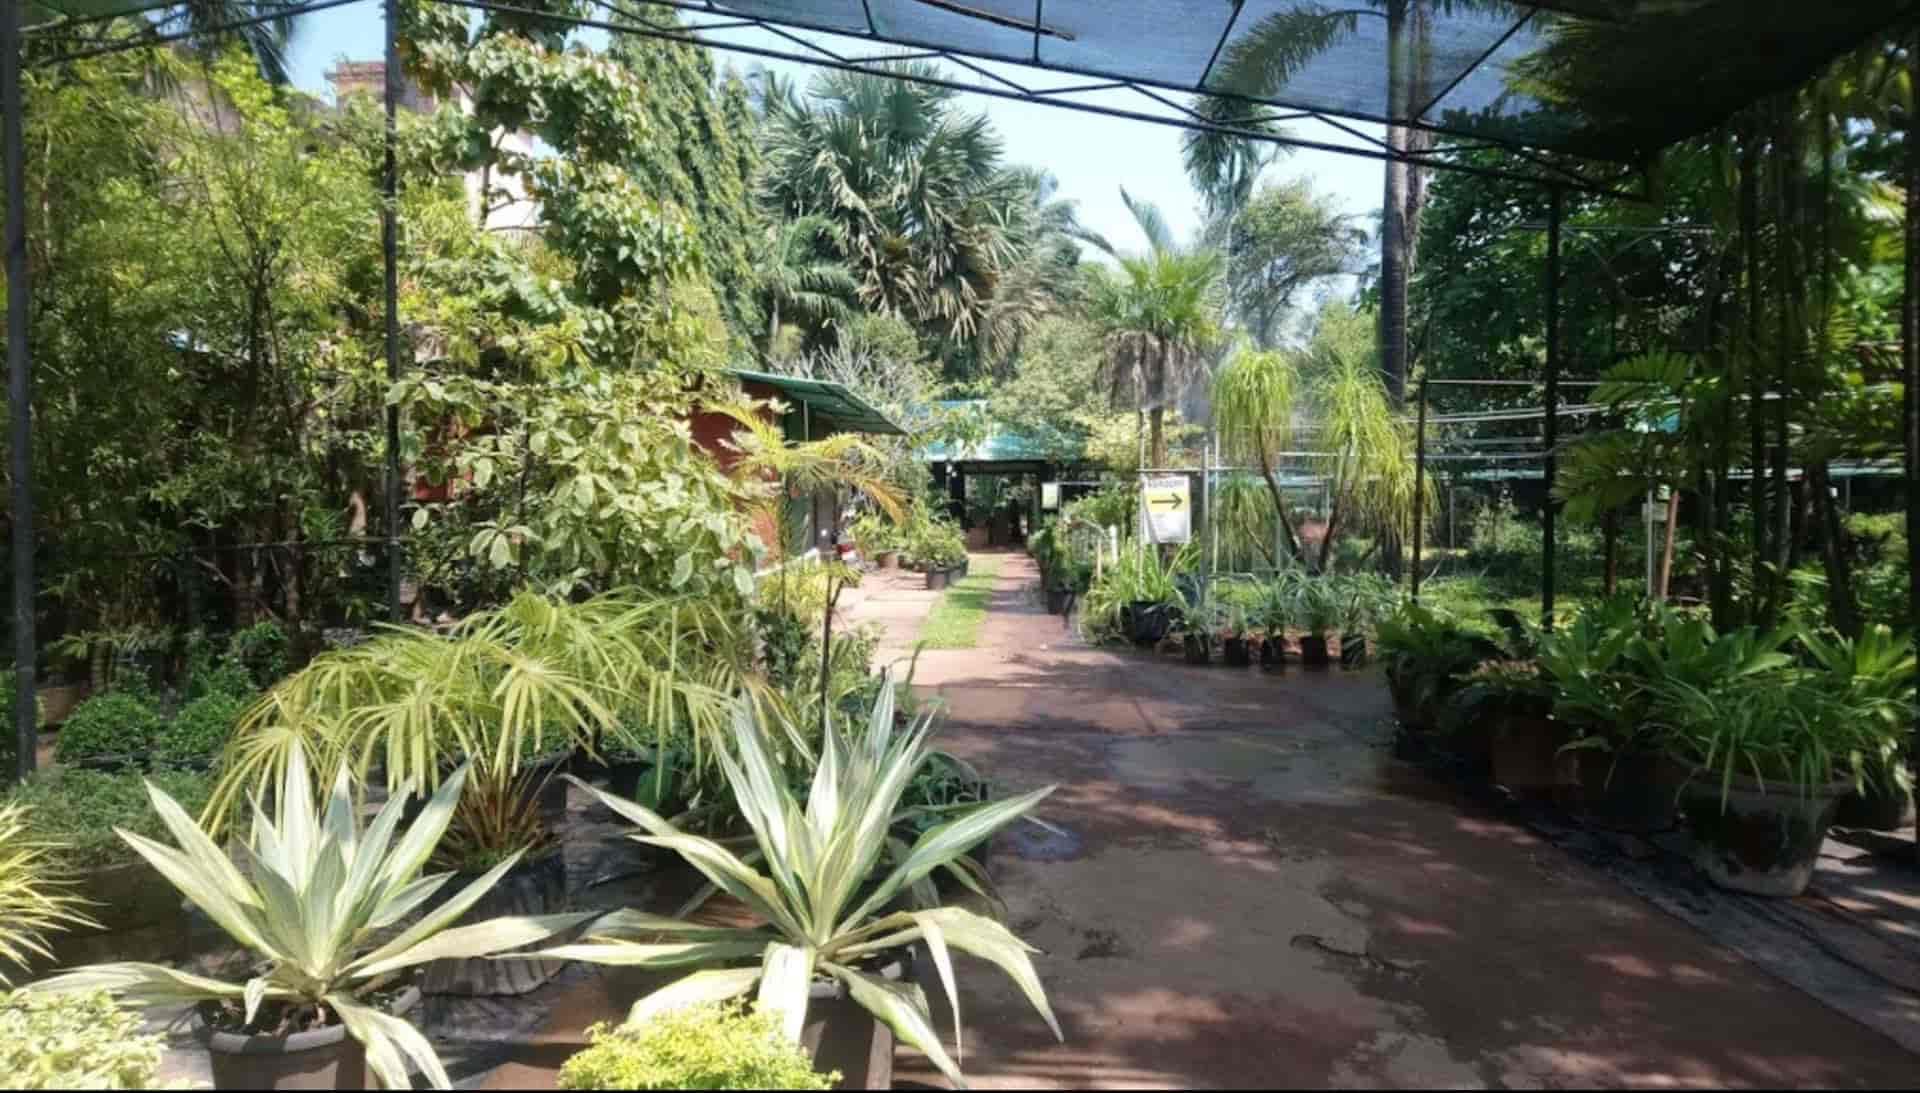 mr farmer india pvt ltd, gurim - plant nurseries in goa - justdial